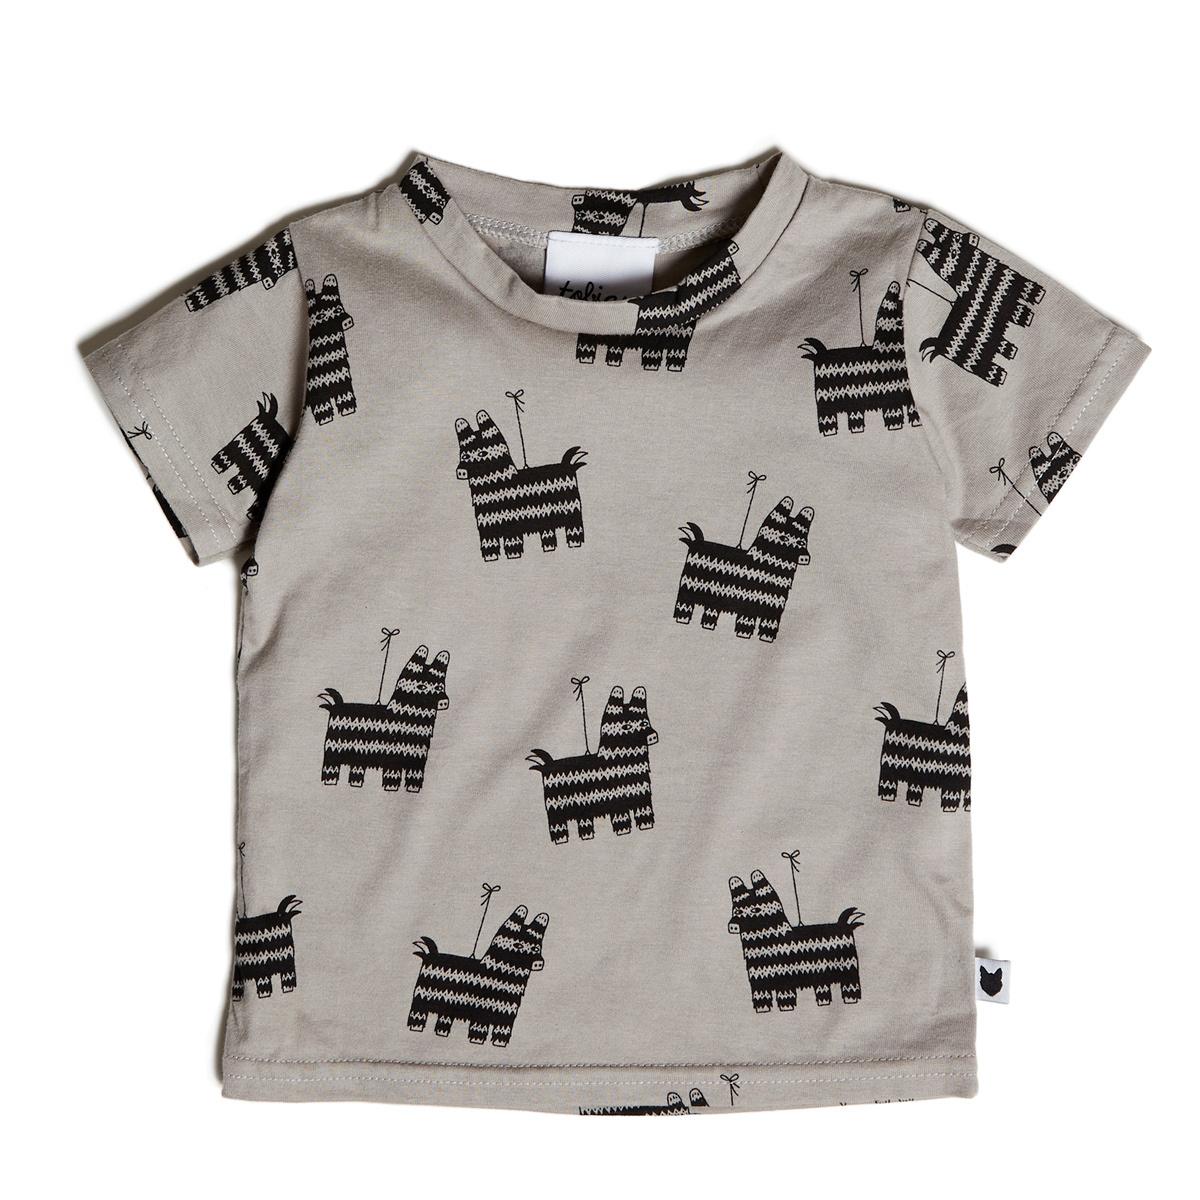 Hauts bébé Tee-Shirt Pinata Party - 18/24 Mois Tee-Shirt Pinata Party - 18/24 Mois